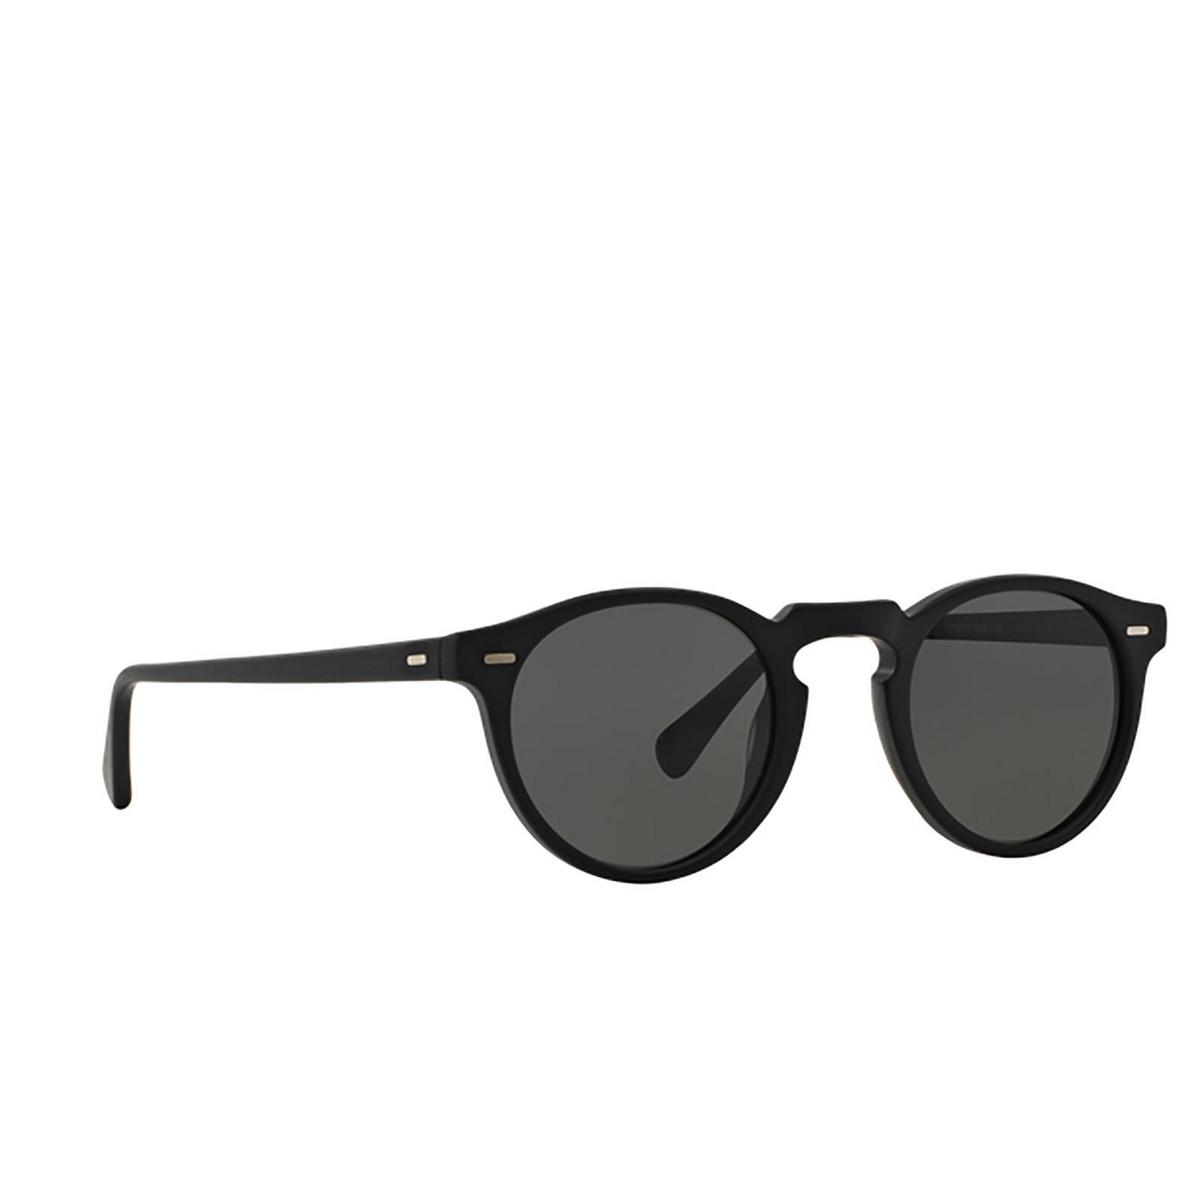 Oliver Peoples® Round Sunglasses: Gregory Peck Sun OV5217S color Semi Matte Black 1031P2 - three-quarters view.